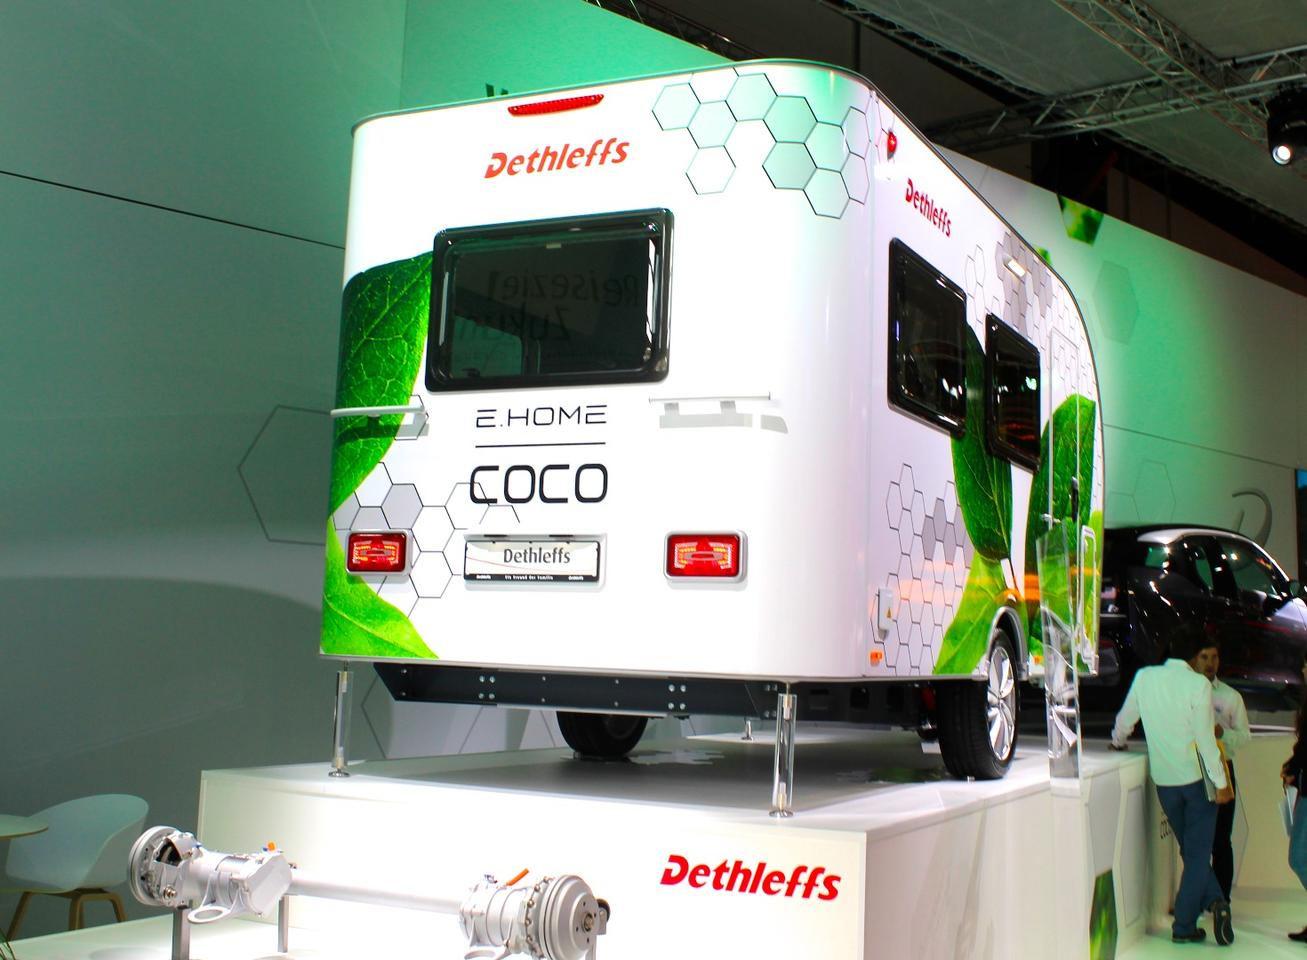 Dethleffs presents the world's first electric caravan